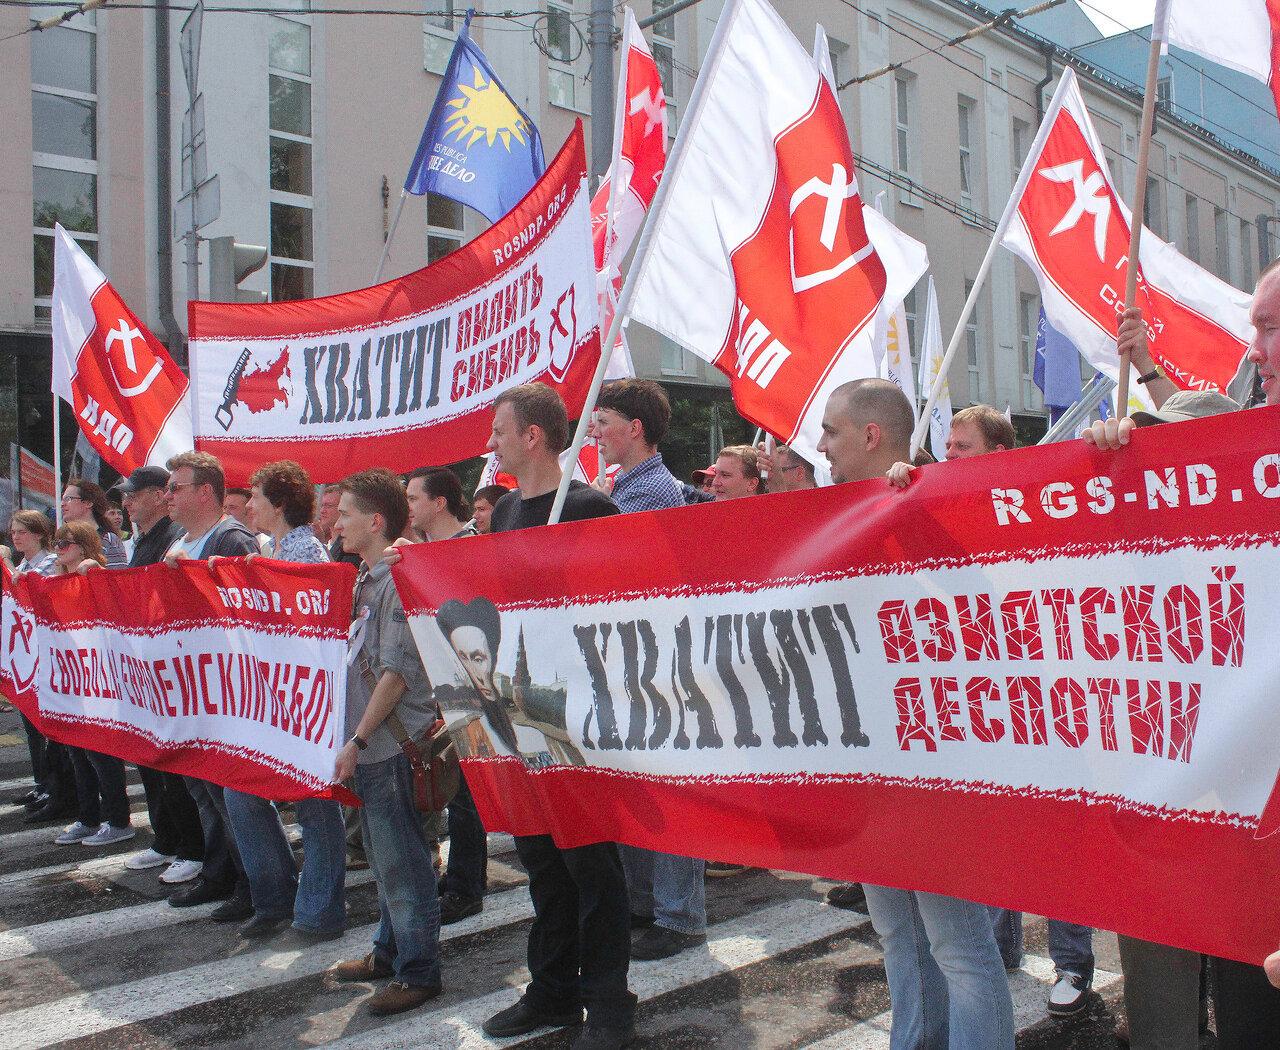 http://img-fotki.yandex.ru/get/6312/36058990.f/0_7d787_7084de62_XXXL